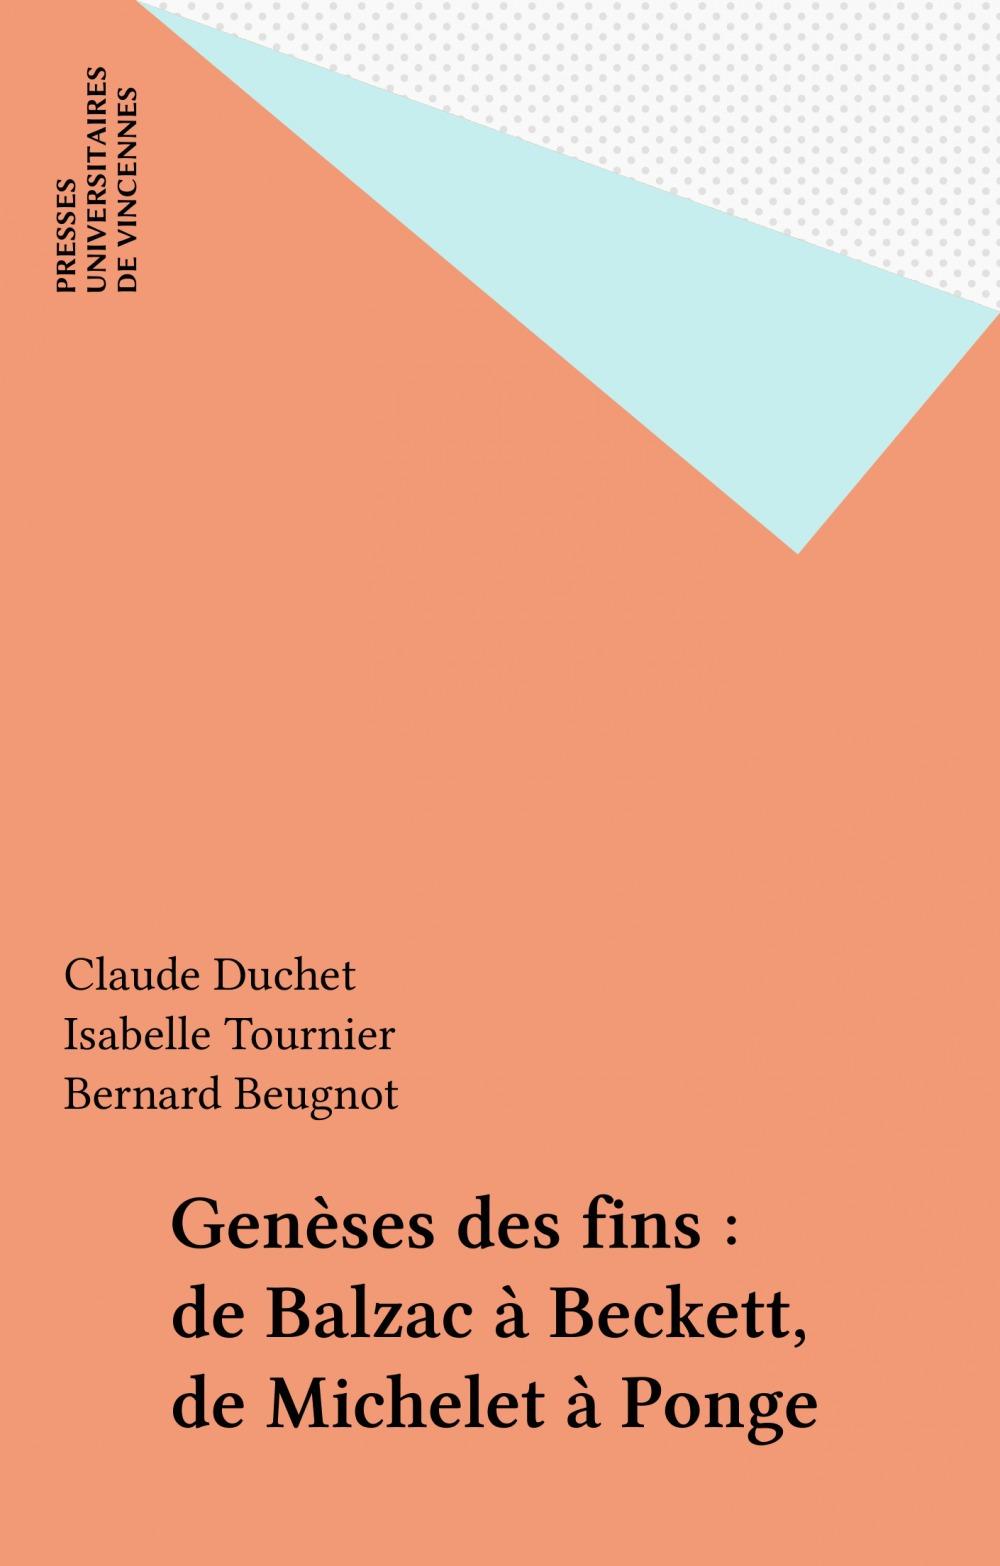 Genèses des fins ; de Balzac à Beckett, de Michelet à Ponge